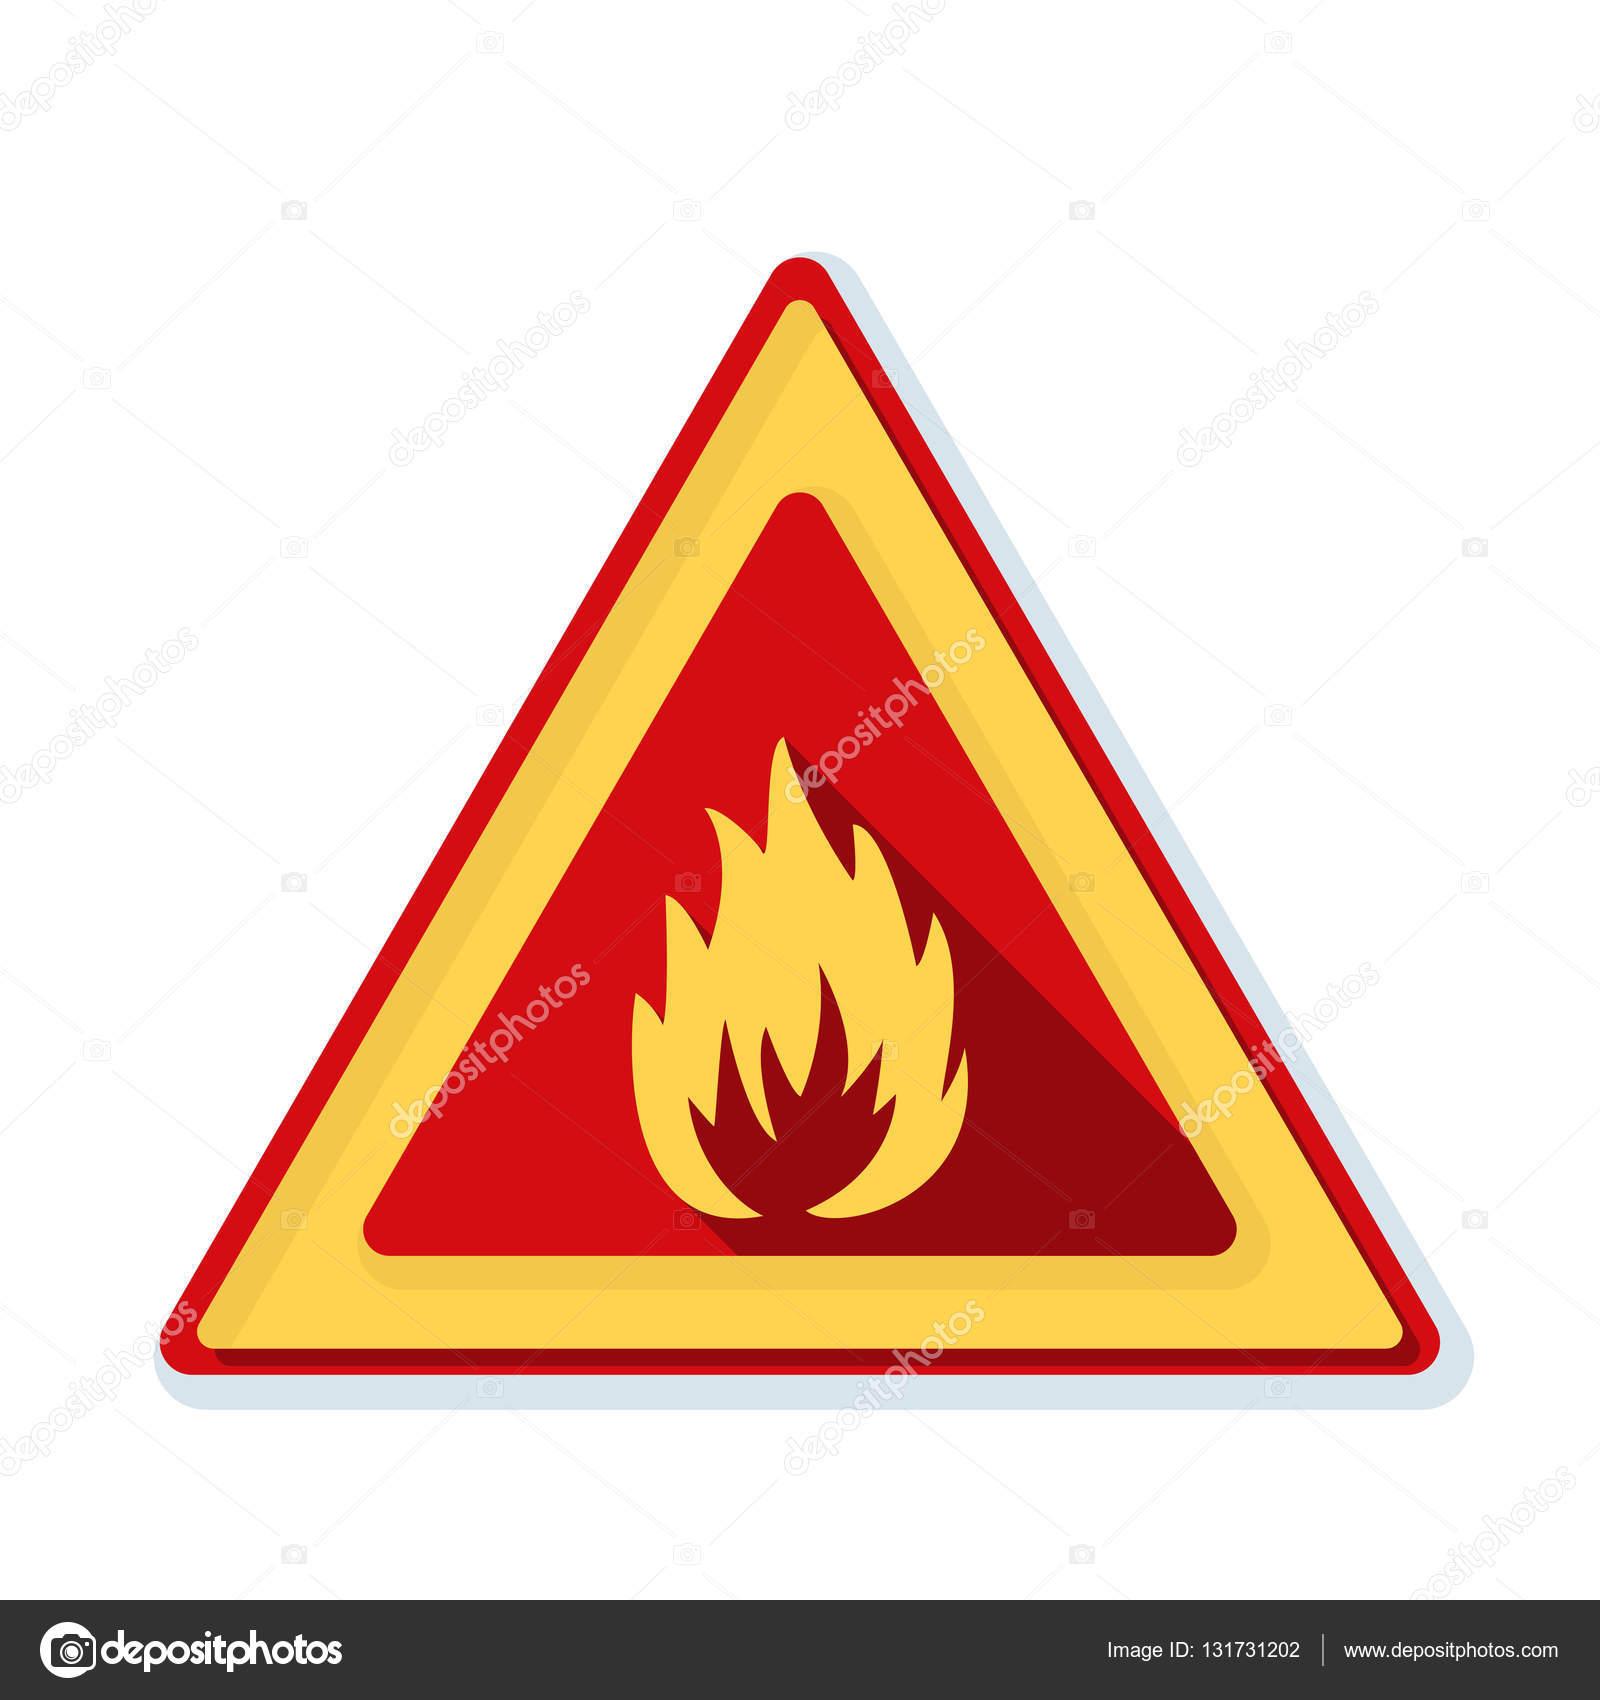 Flammable danger sign stock vector yuriyvlasenko 131731202 flammable danger sign stock vector buycottarizona